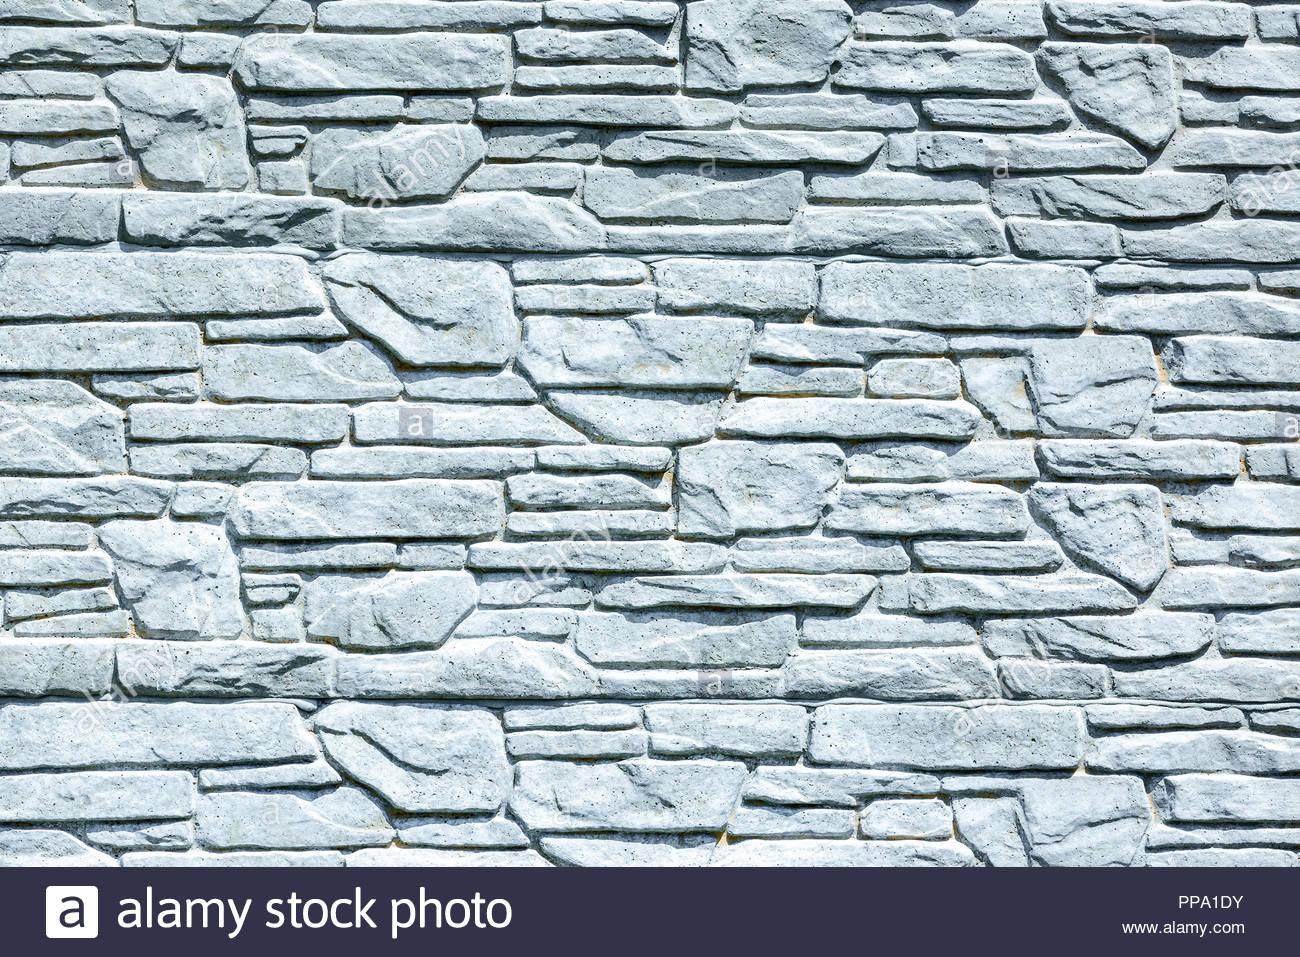 white brick wall background grungy rusty blocks of stonework 1300x957